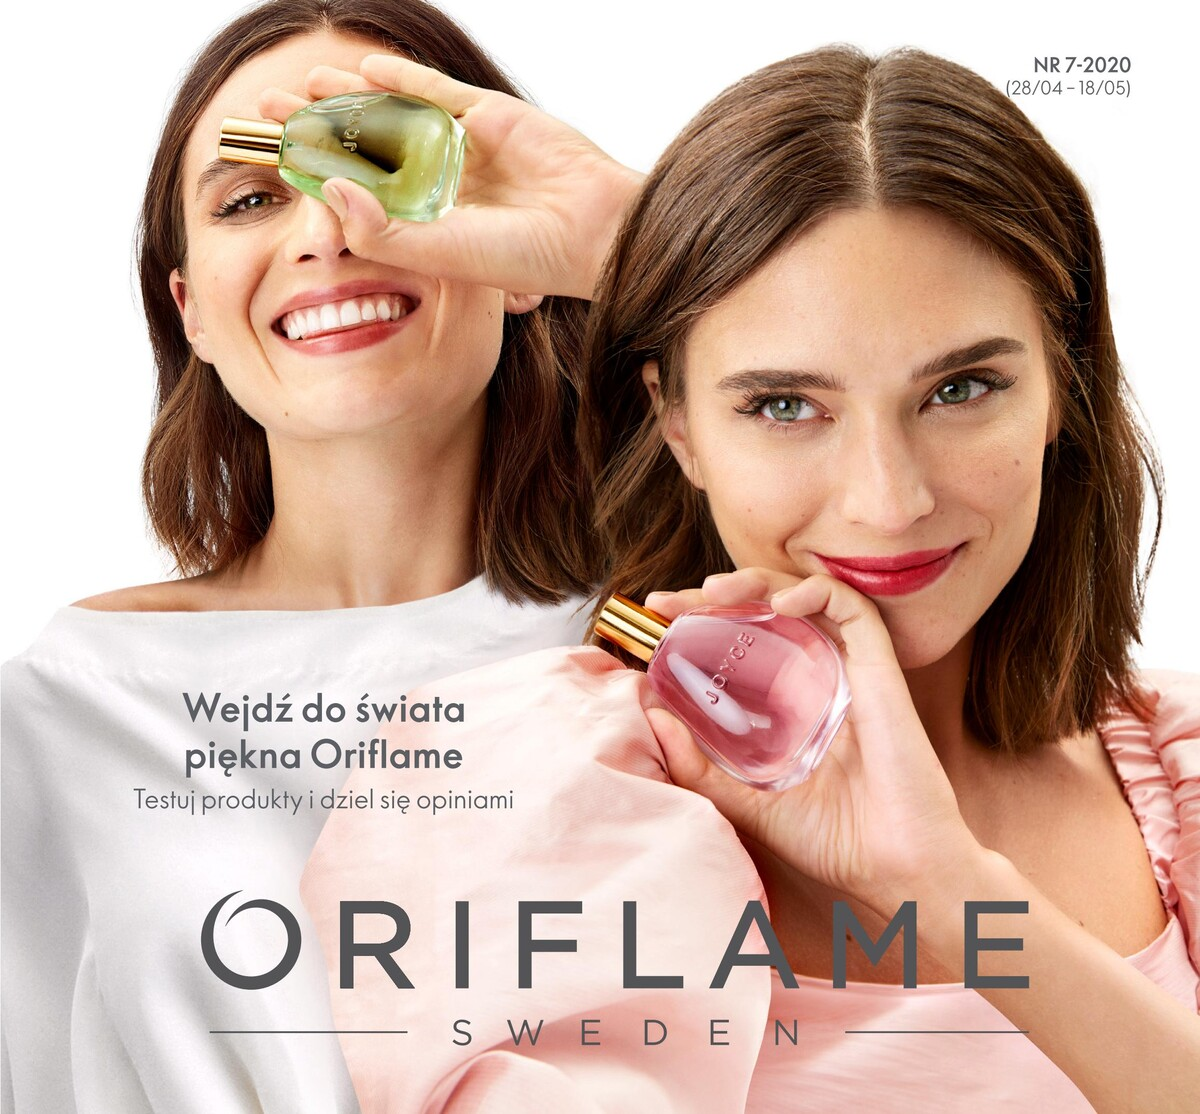 Gazetka Oriflame - Katalog nr 07-2020